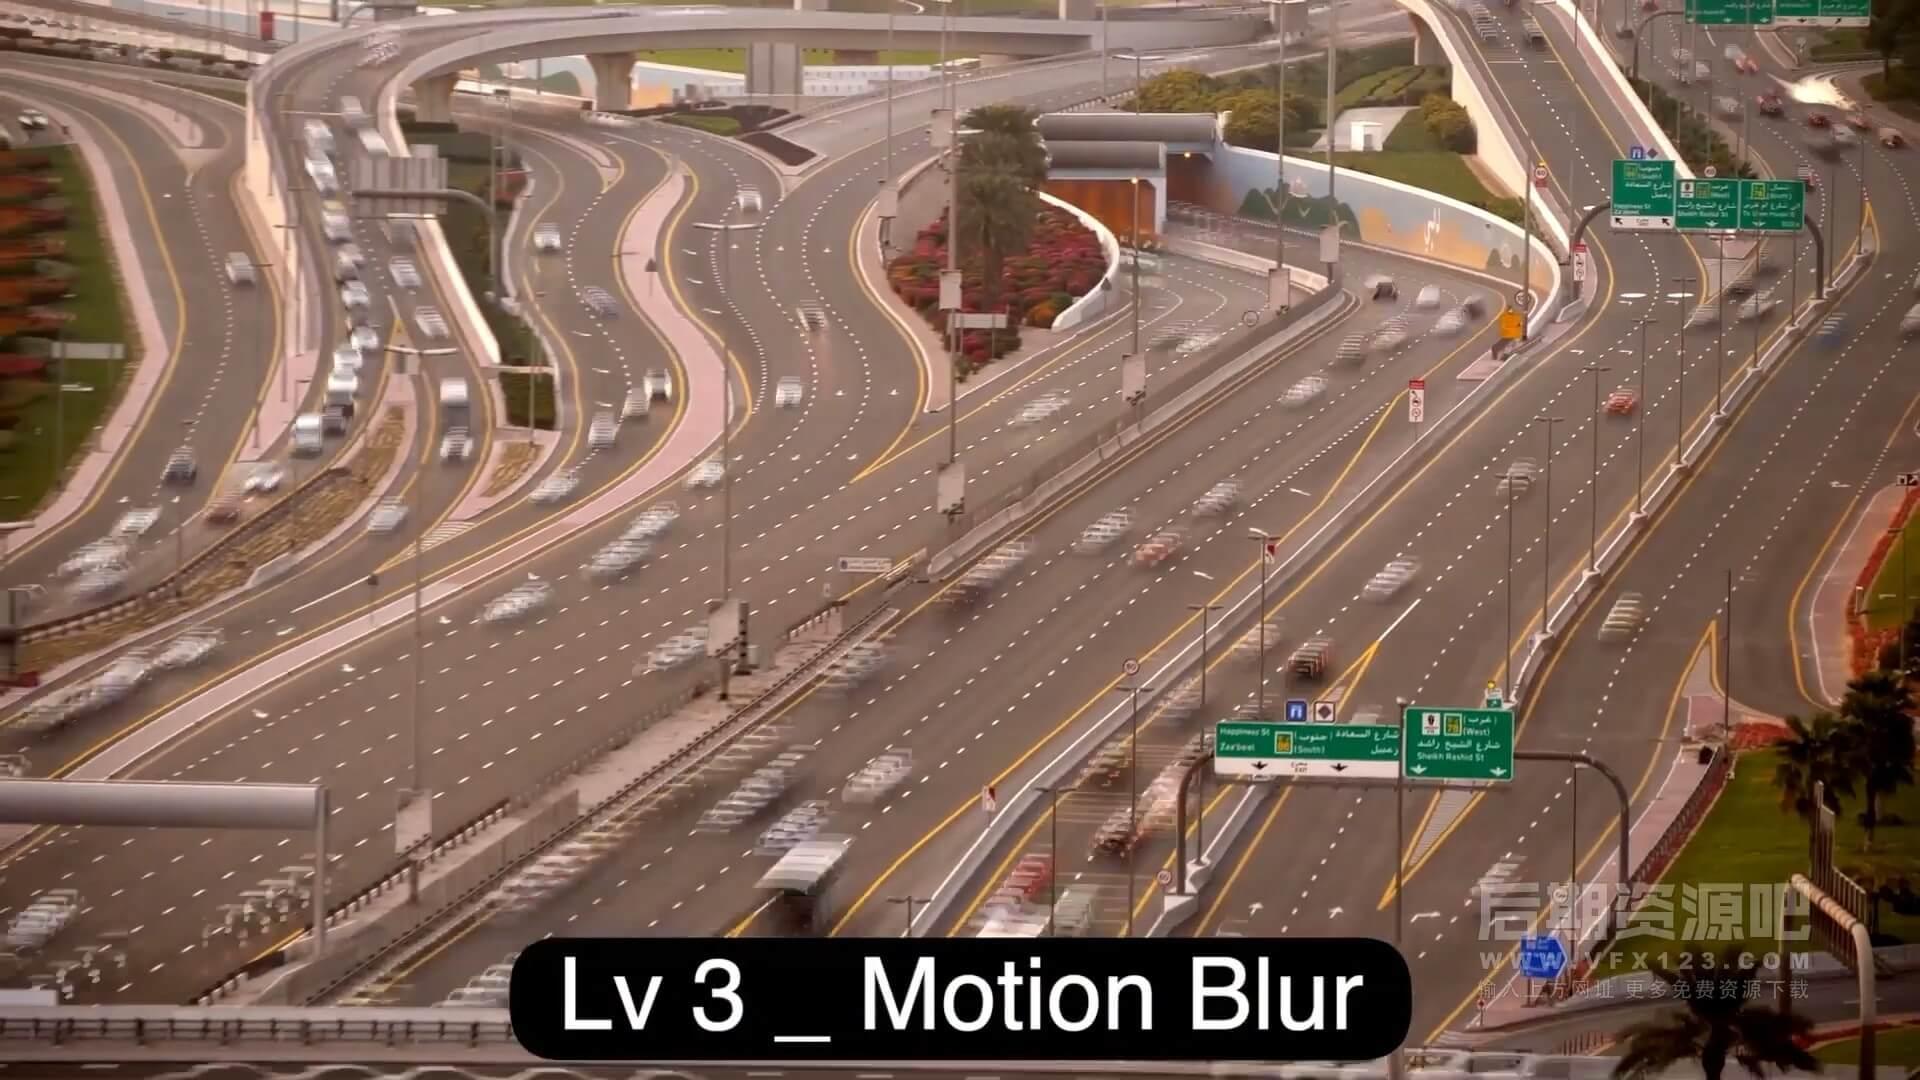 FCPX效果插件 为影片添加动态模糊特效工具 Motion Blur tools